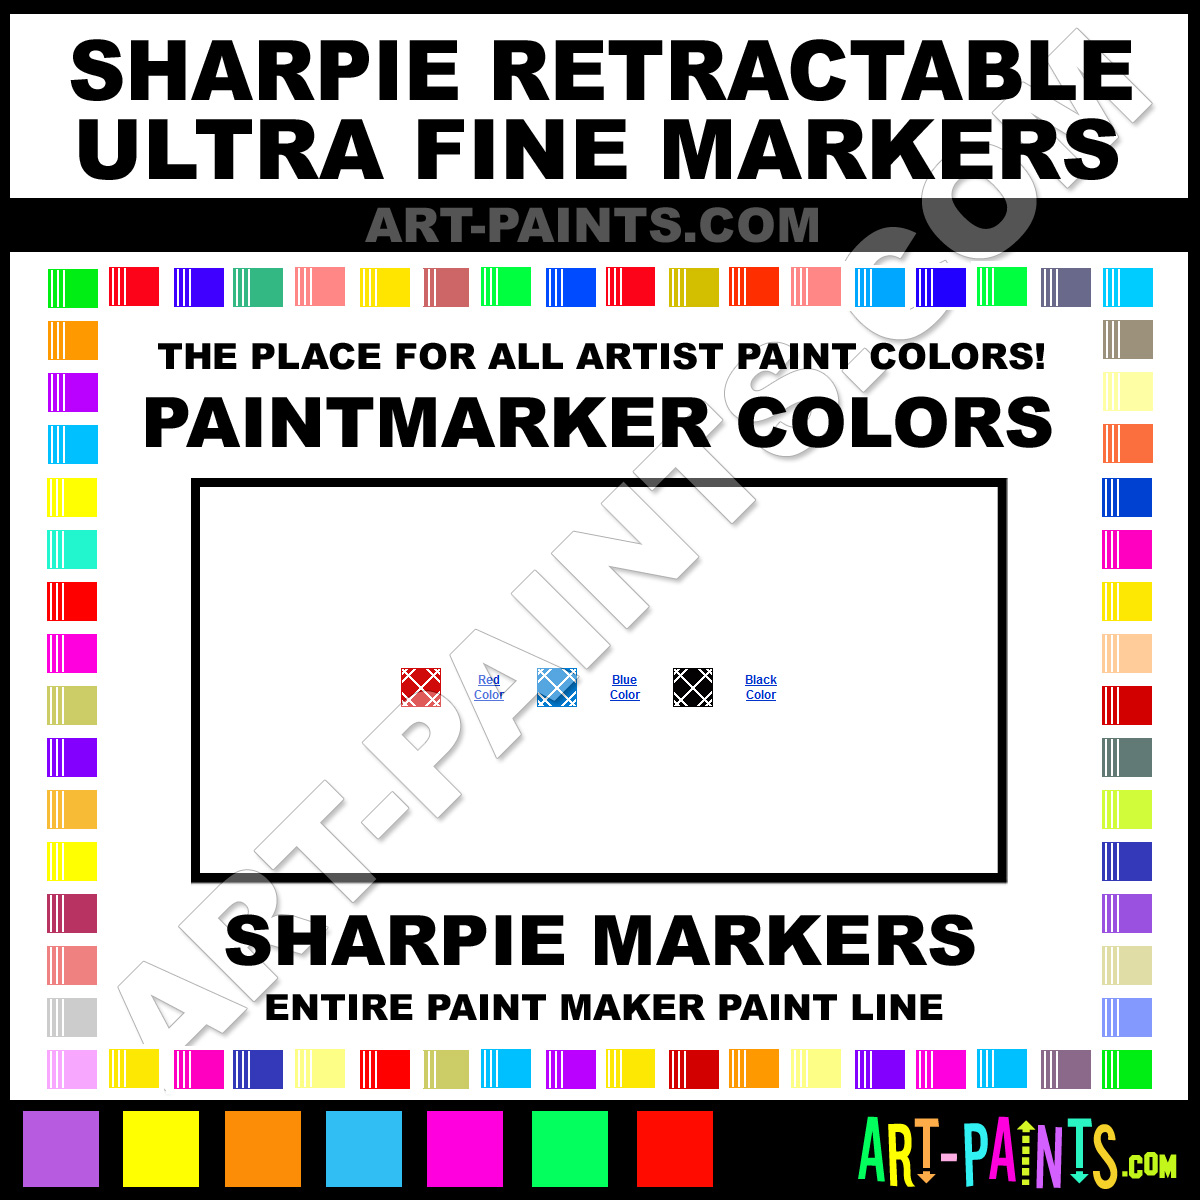 Sharpie Retractable Ultra Fine Permanent Marker Sharpie Retractable Ultra Fine